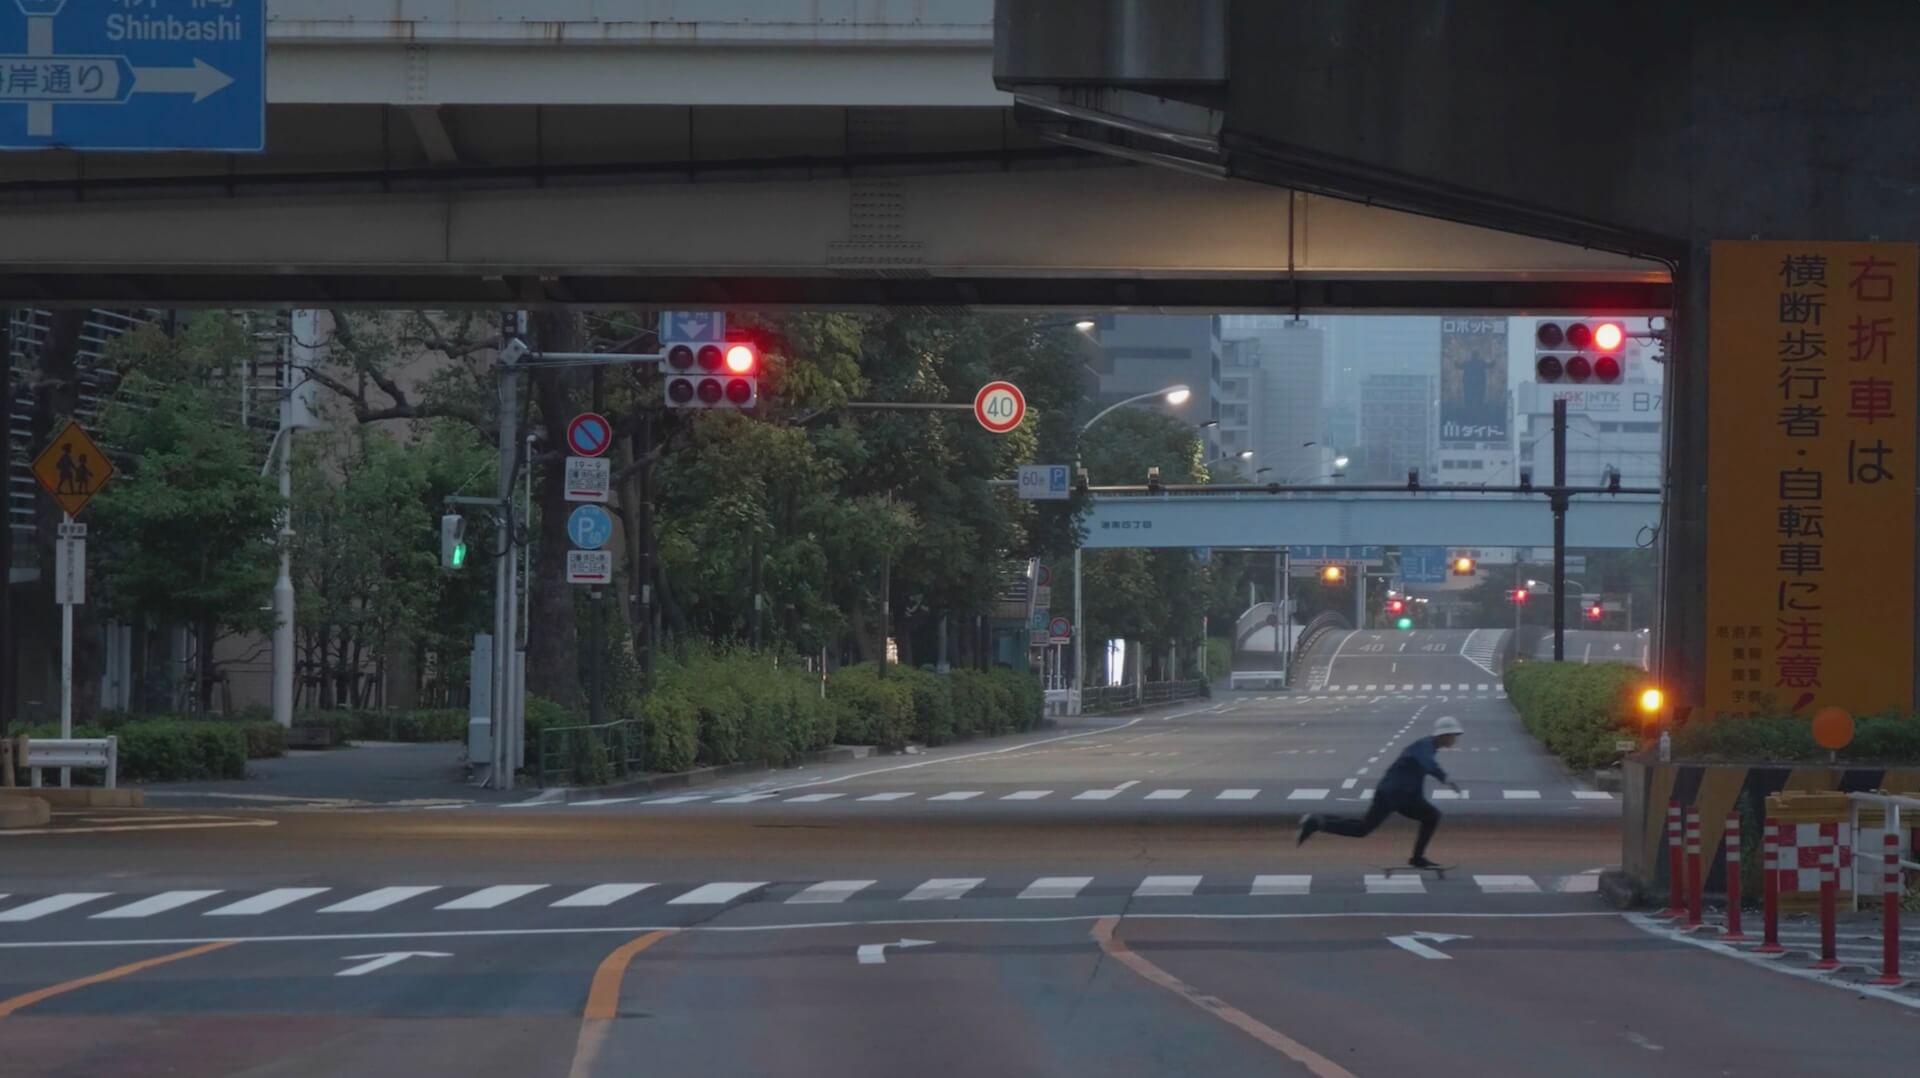 Diaspora skateboardsの新作ビデオ『SYMBIOSIS』の試写イベントにDaichi Yamamoto、tofubeatsが追加出演決定|アフターパーティーにAru-2、Kazuhiko Fujitaも music191226_diasporaskateboards_6